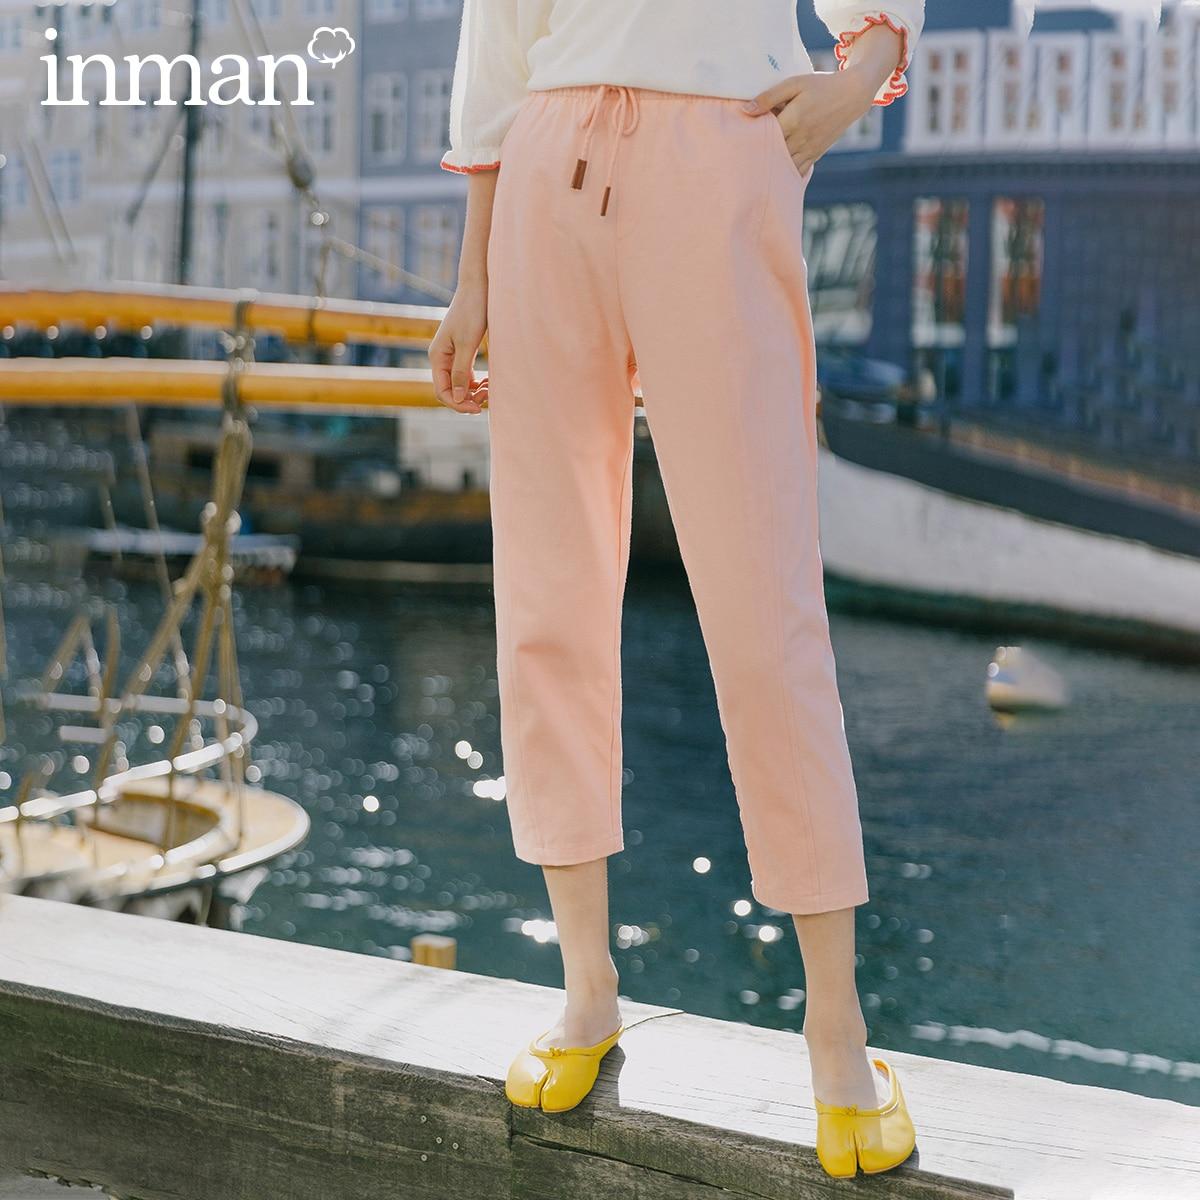 INMAN 2020 Spring New Arrival Literary High Waist Drawstring Elasticized Waist Loose Slimming Eight-cen Women Pant